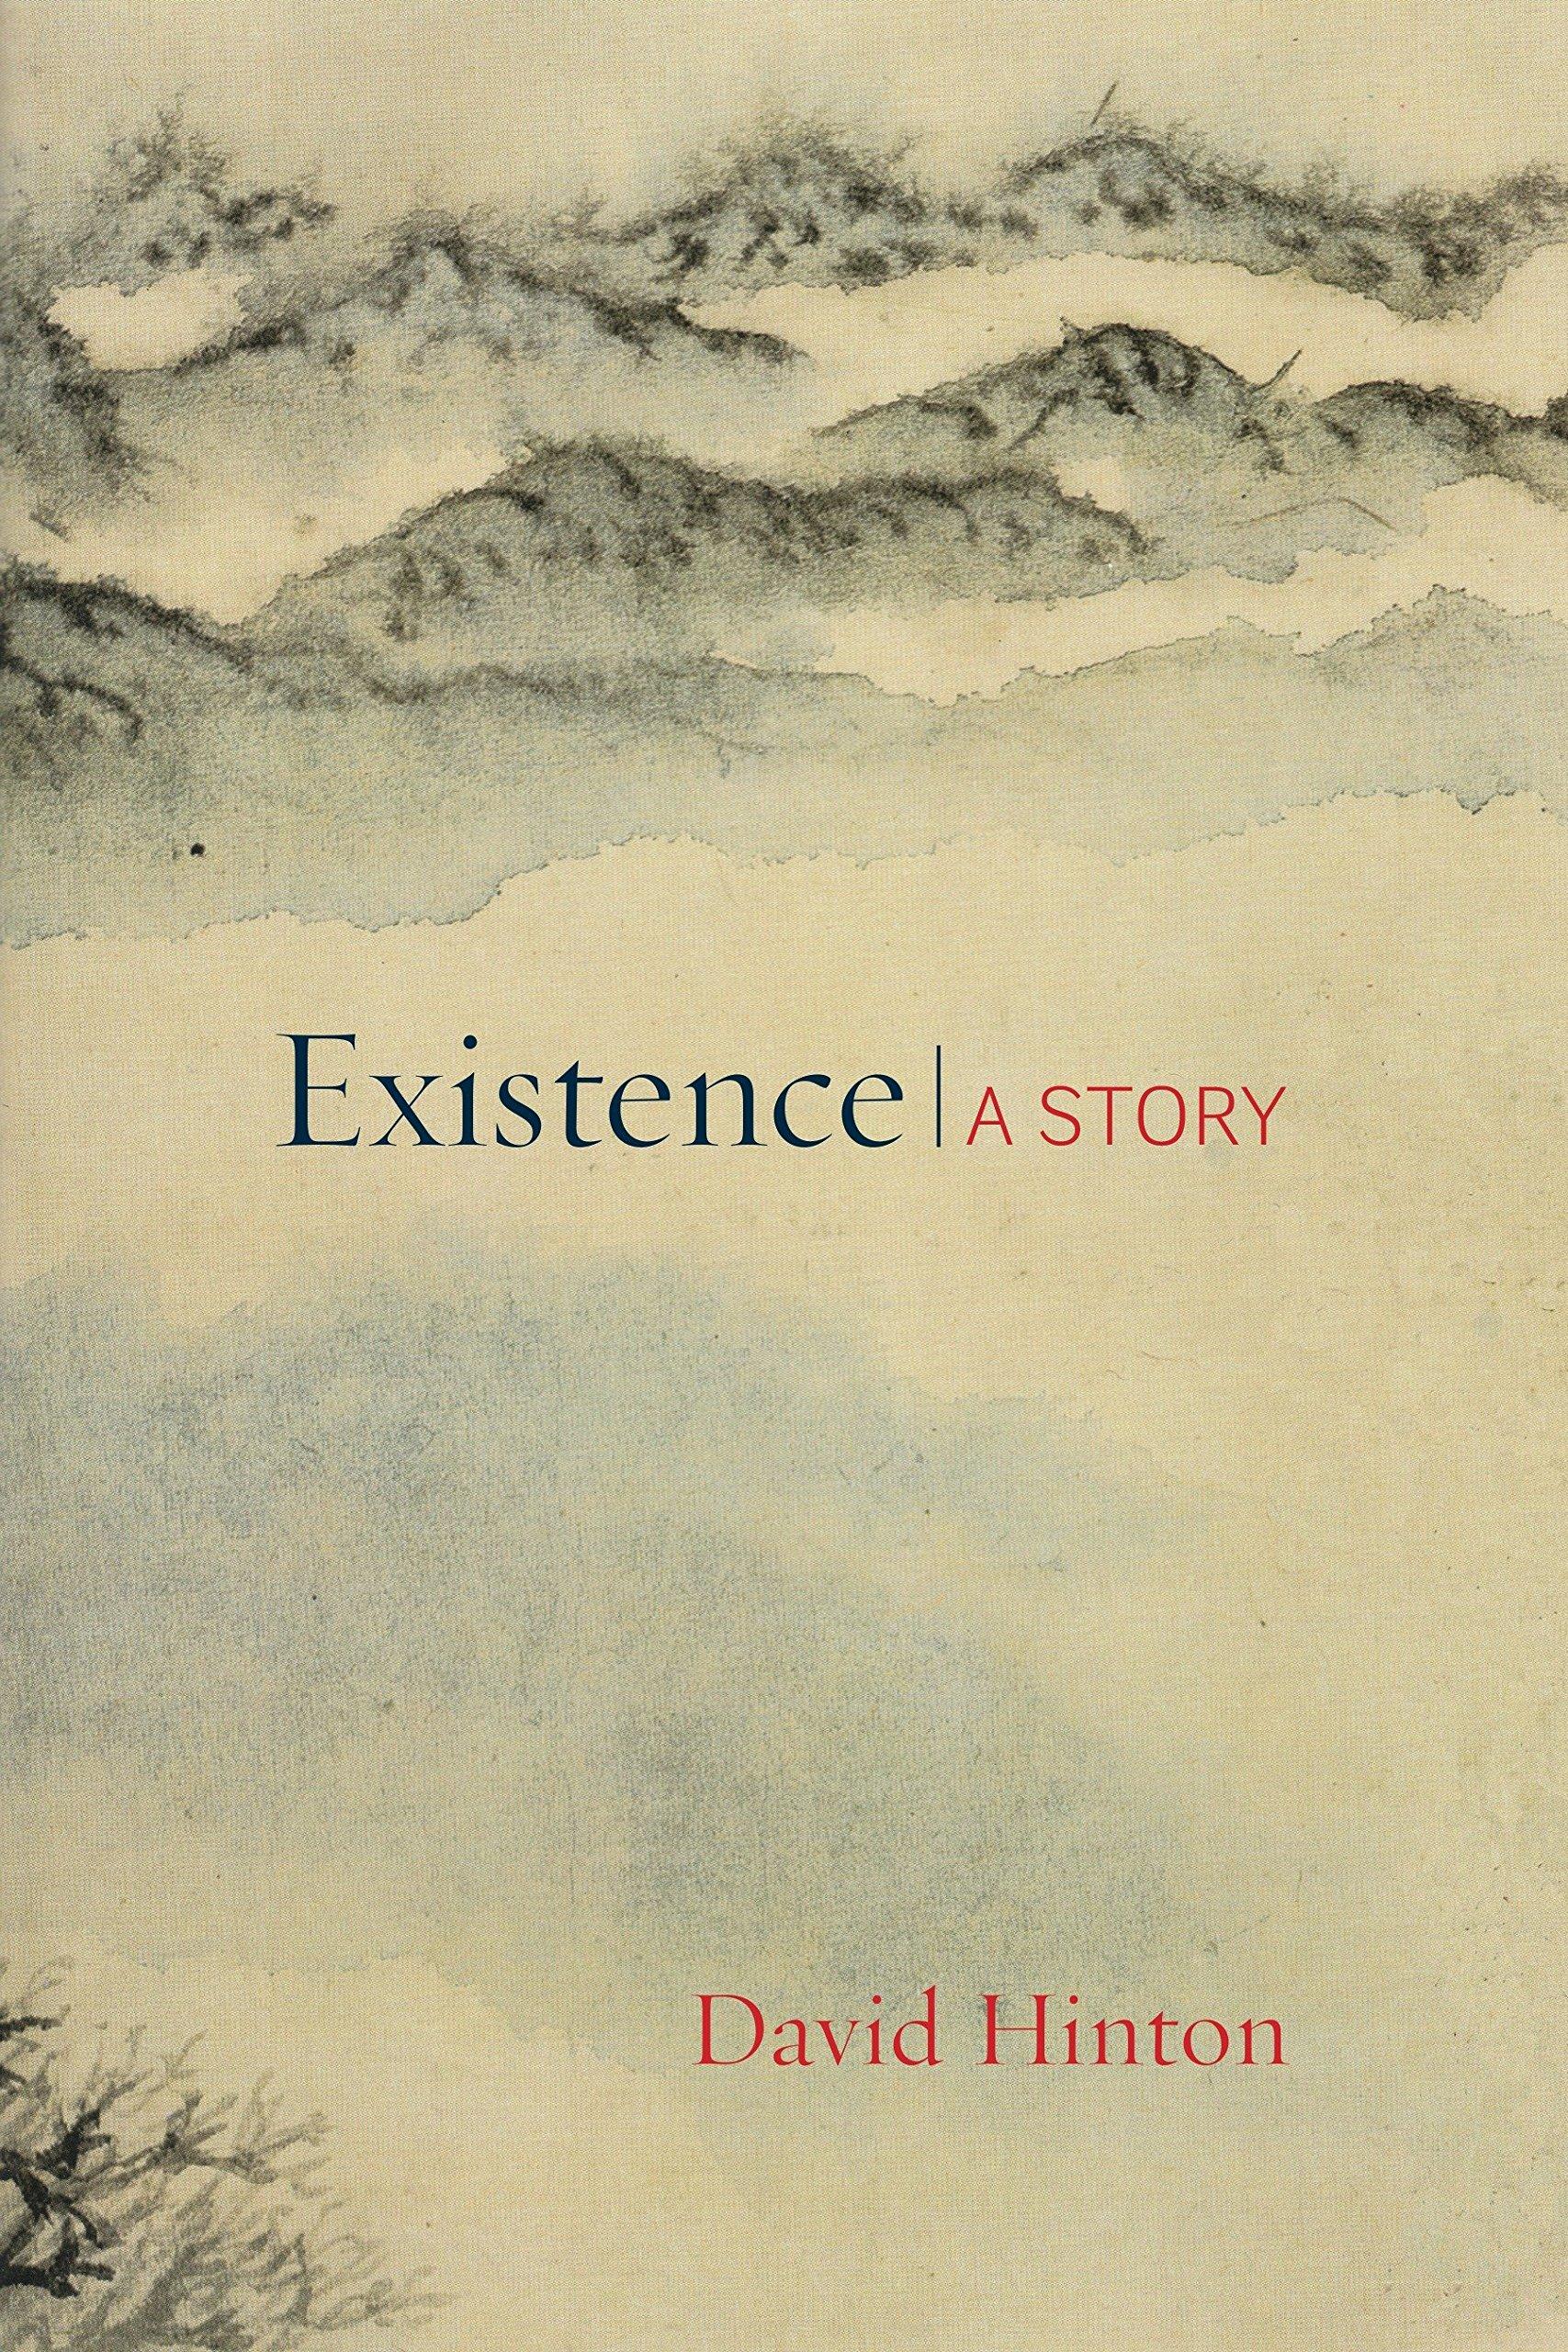 Existence: A Story PDF